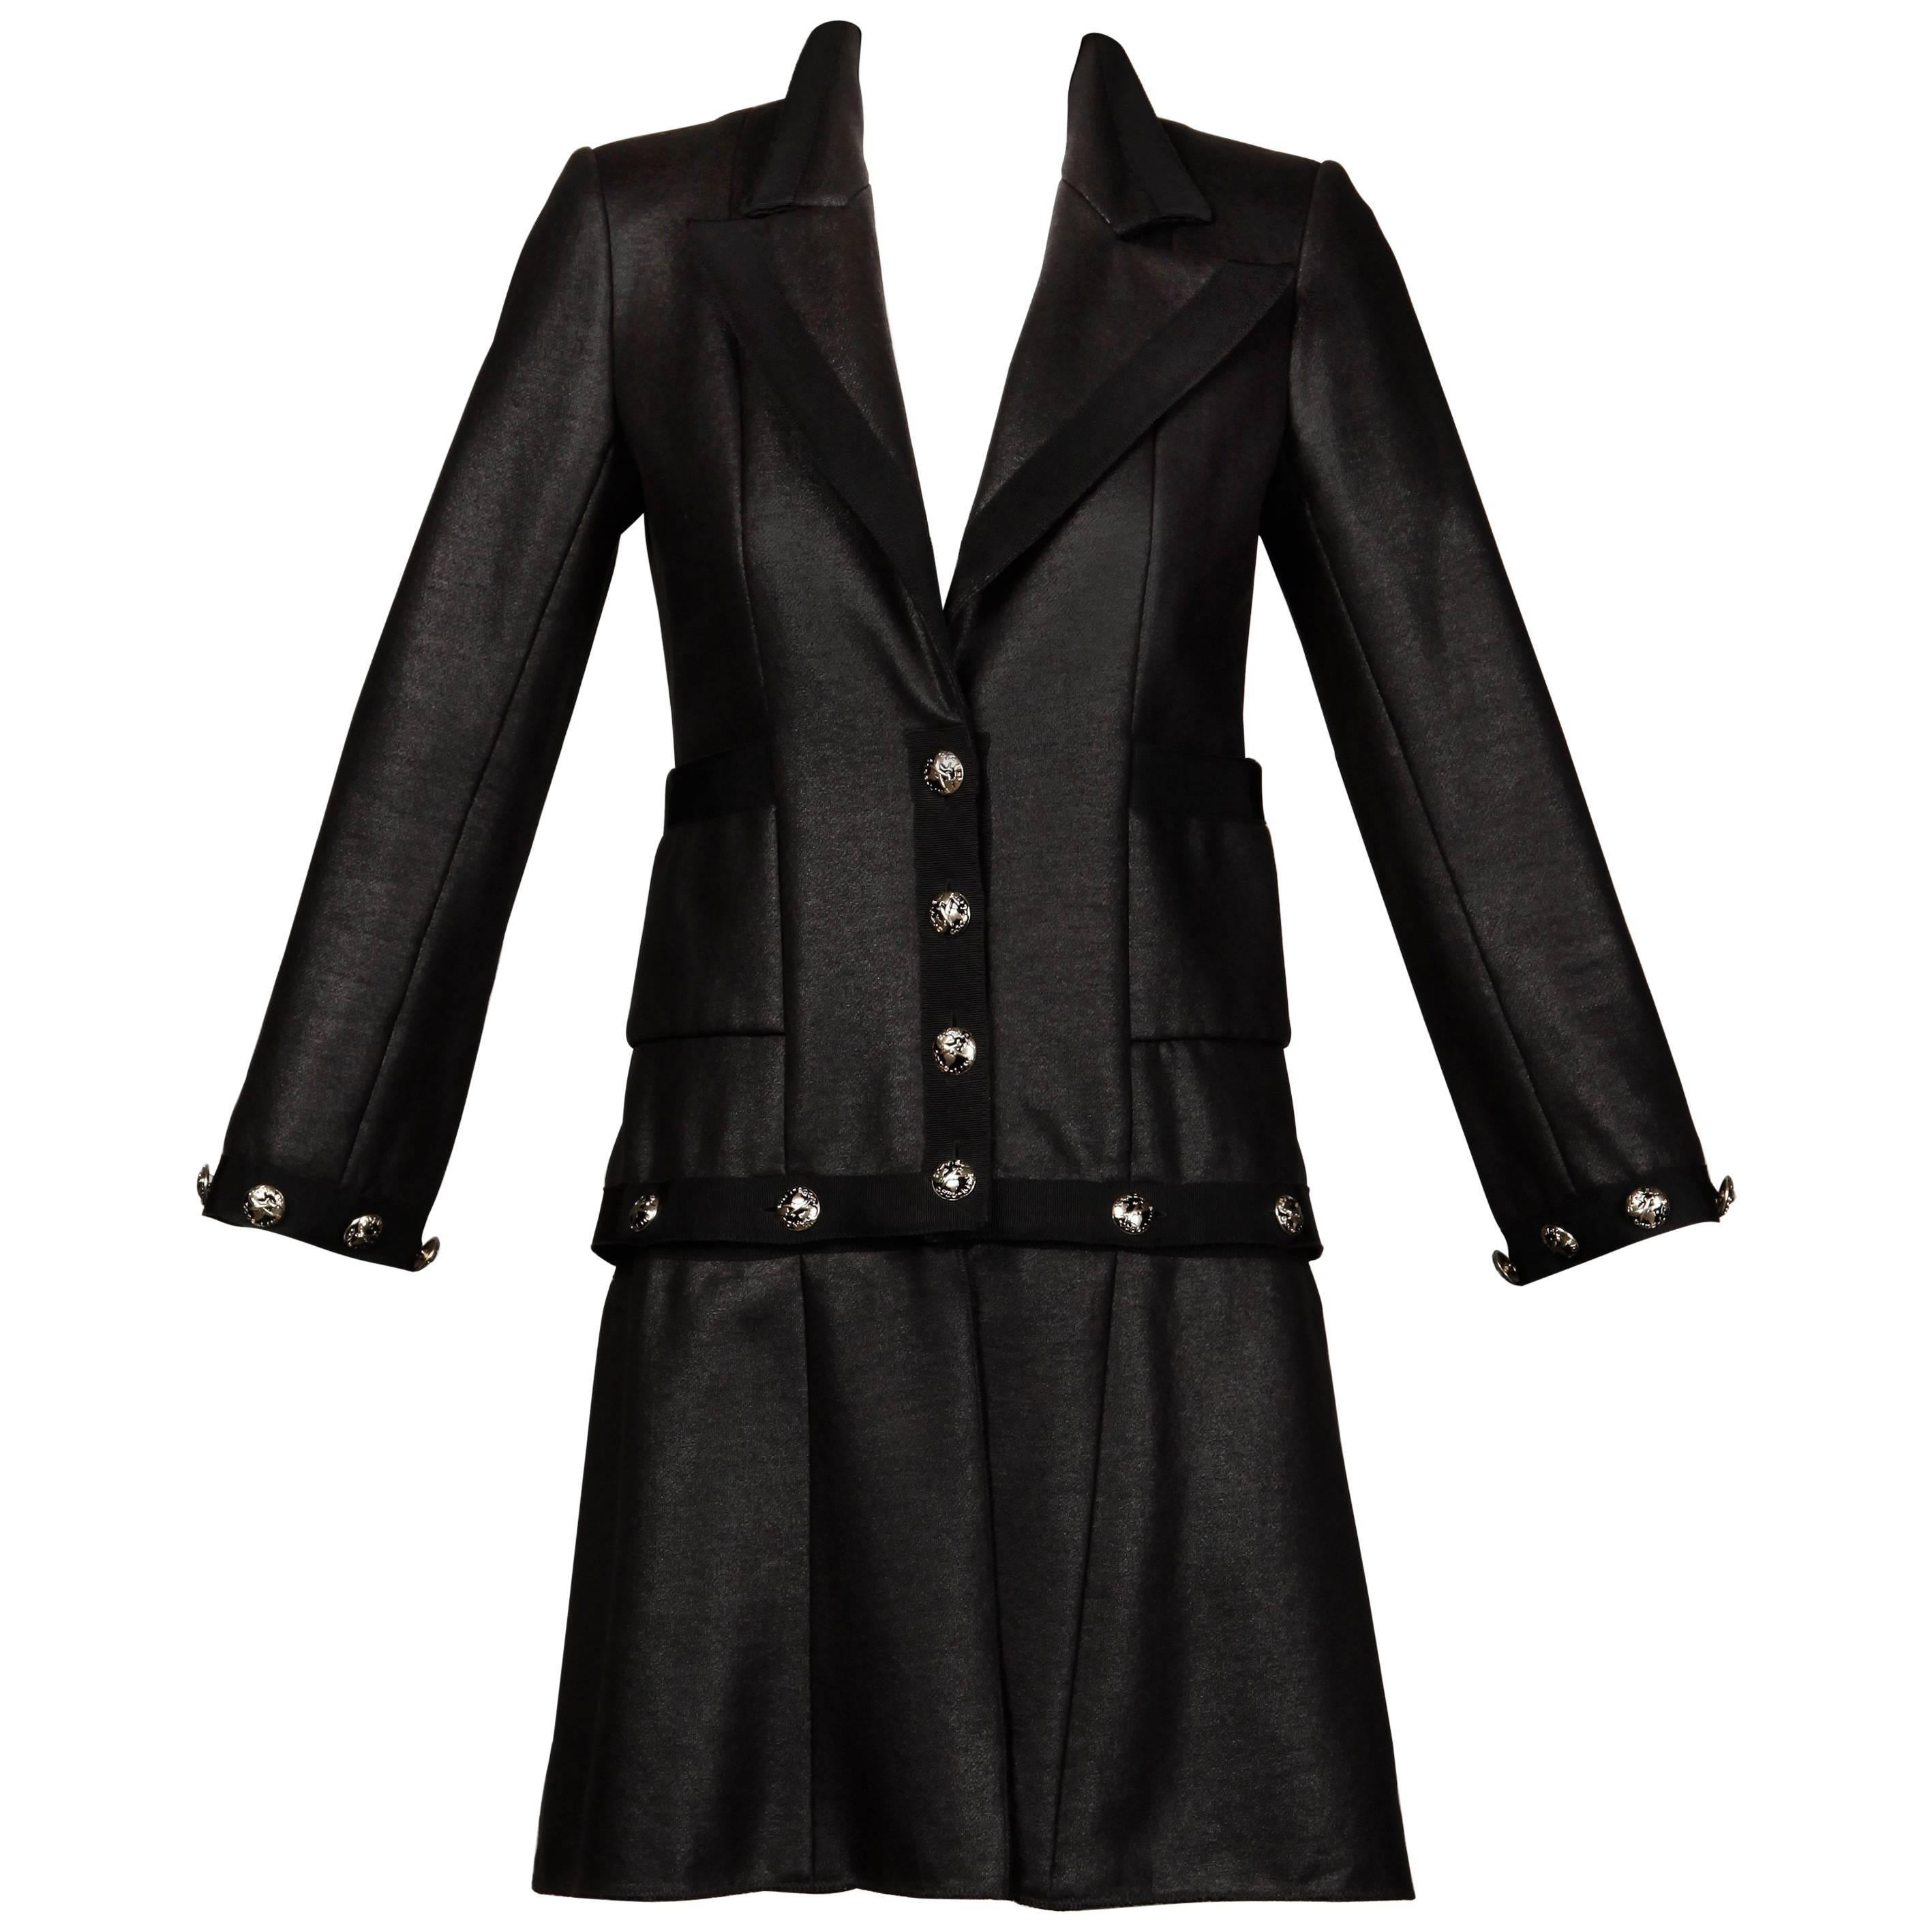 2008 Chanel Convertible Jacket + Coat